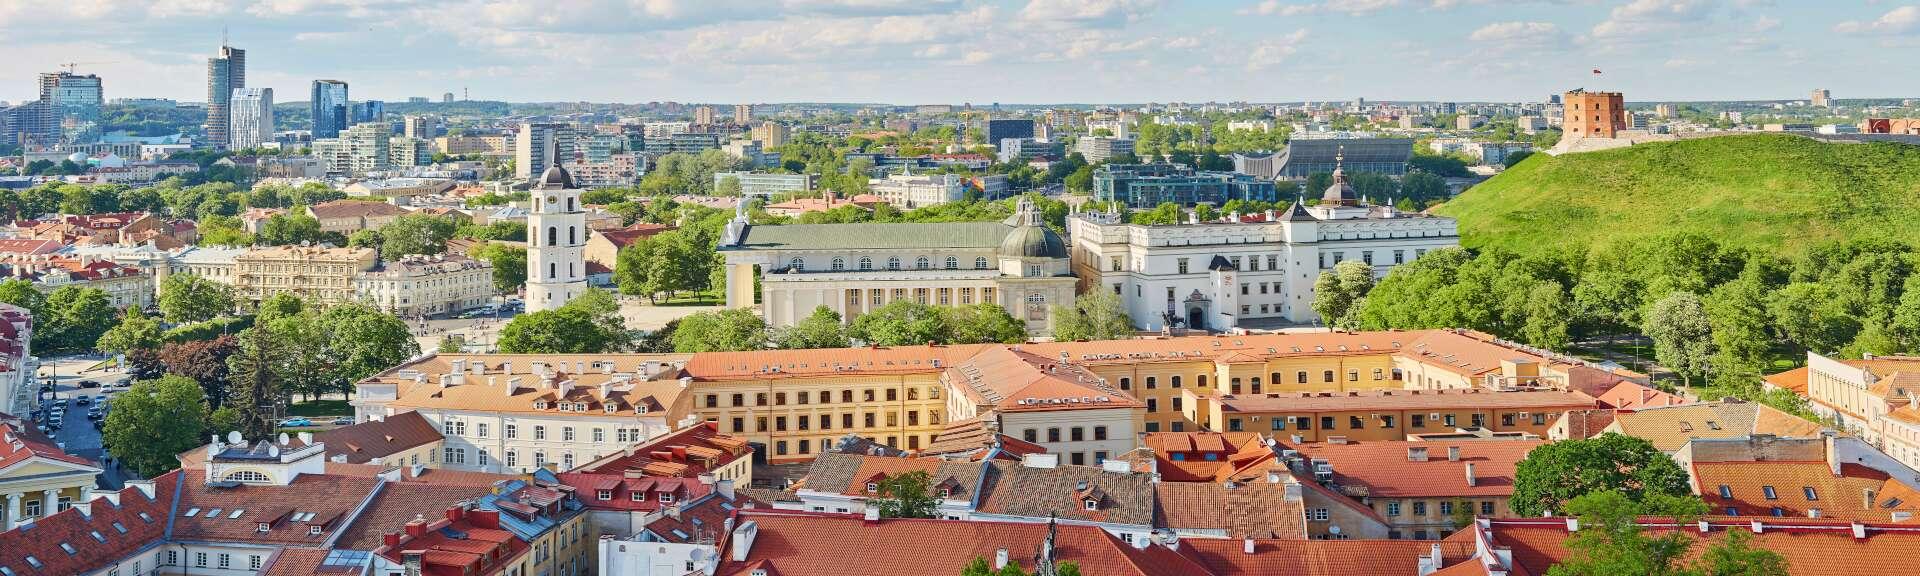 Klassenfahrt Vilnius Stadtansicht